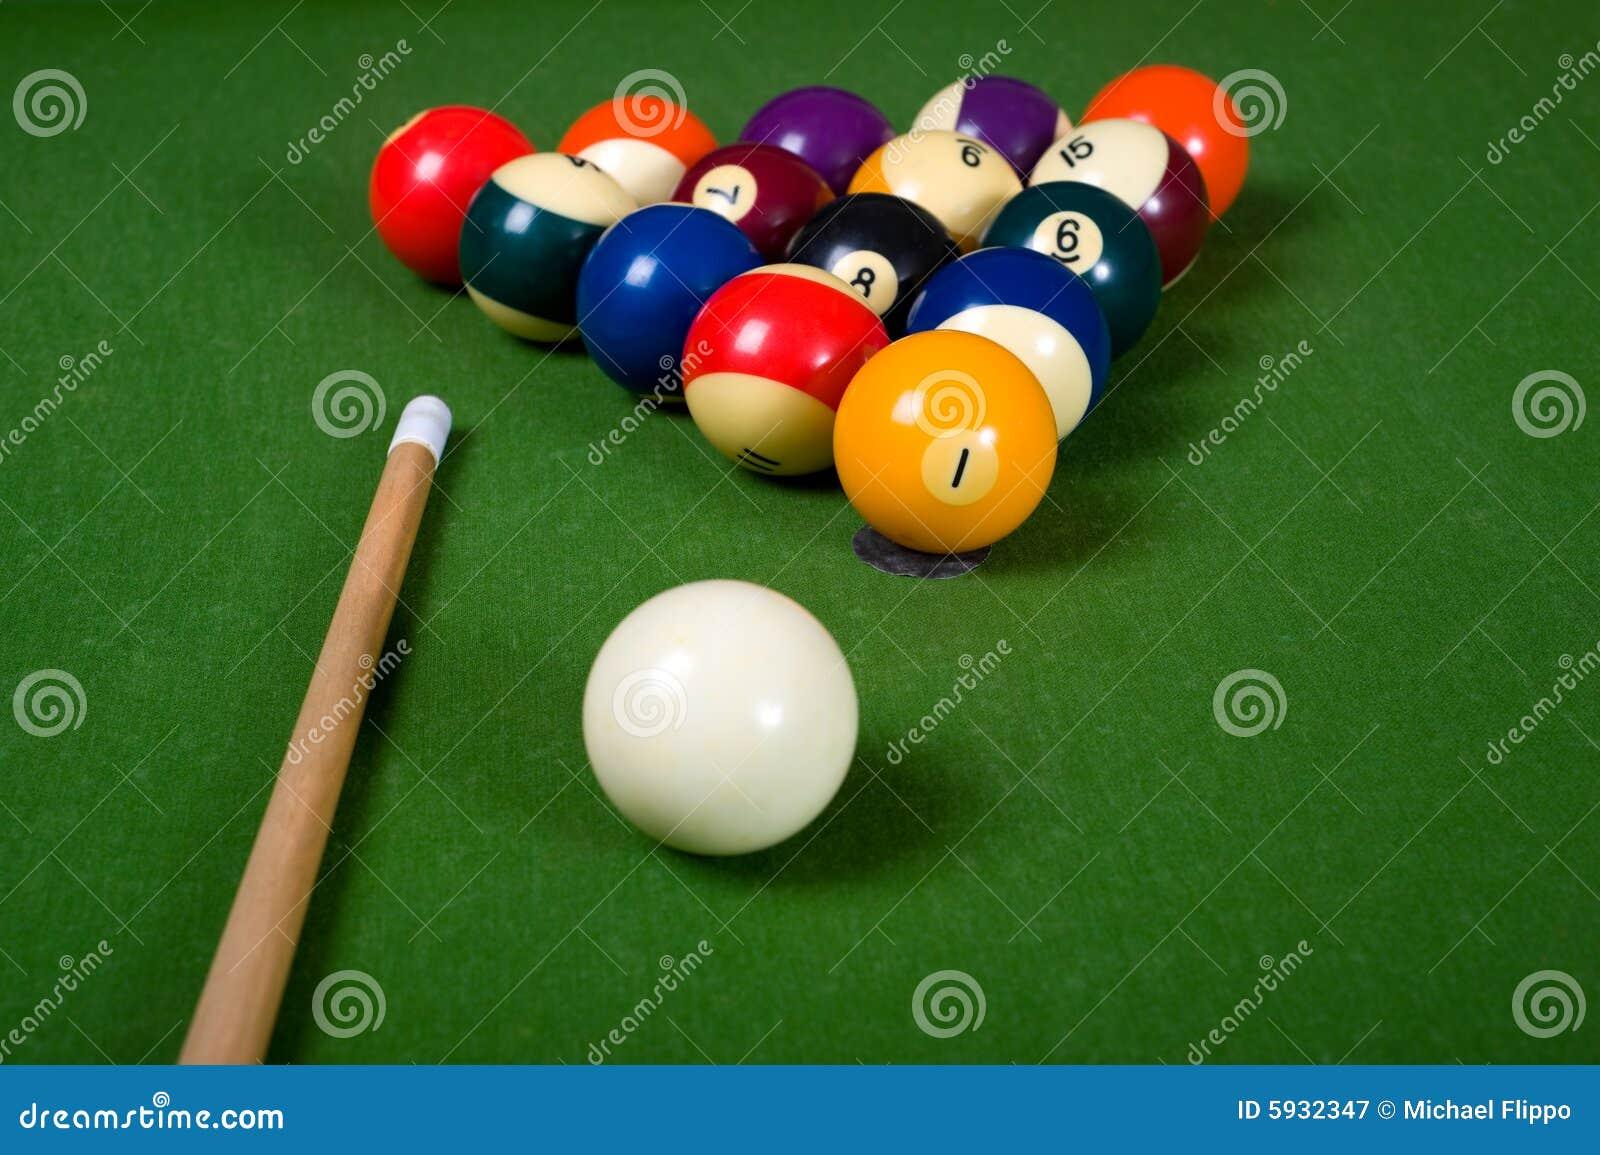 Billiards of Pool